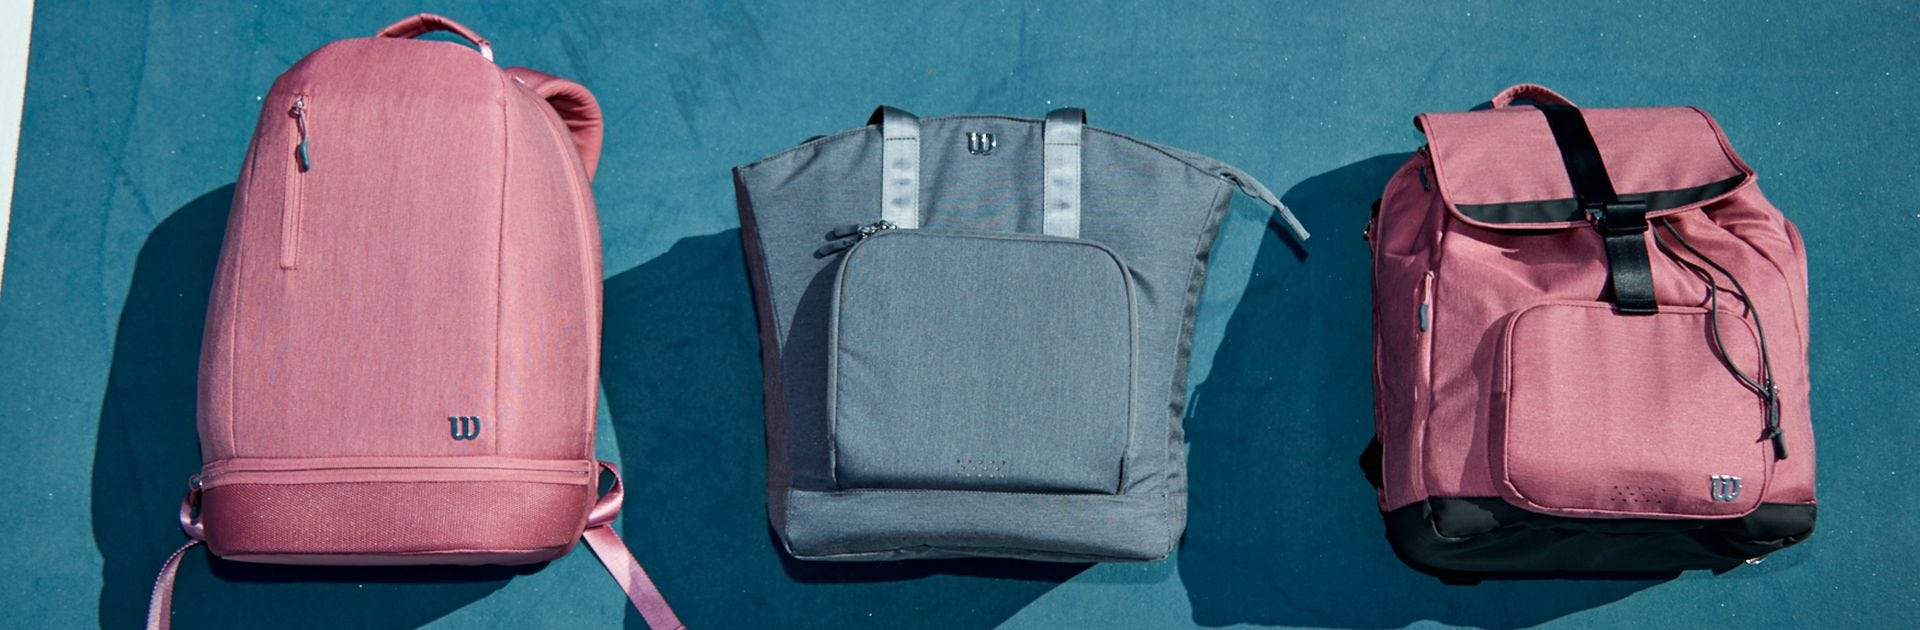 Womens Tennis Bag range laid on tennis court